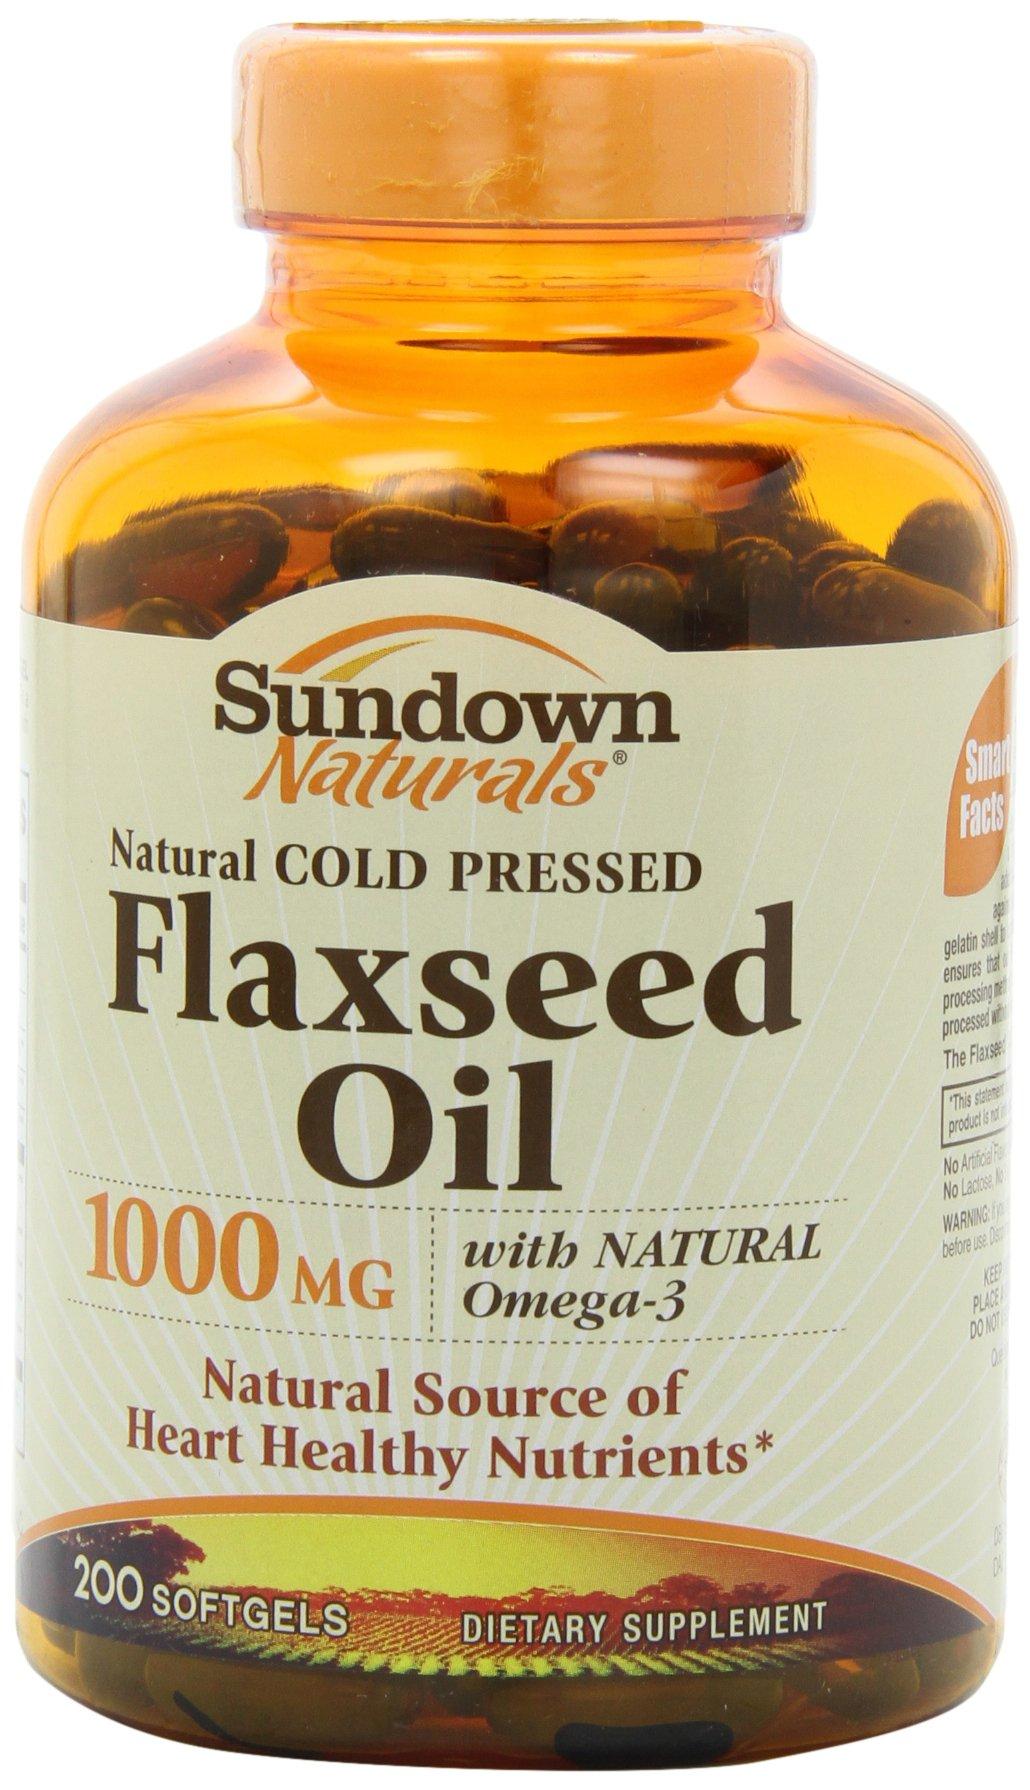 Sundown Naturals Flaxseed Oil 1000 Mg Softgels, 200 Count